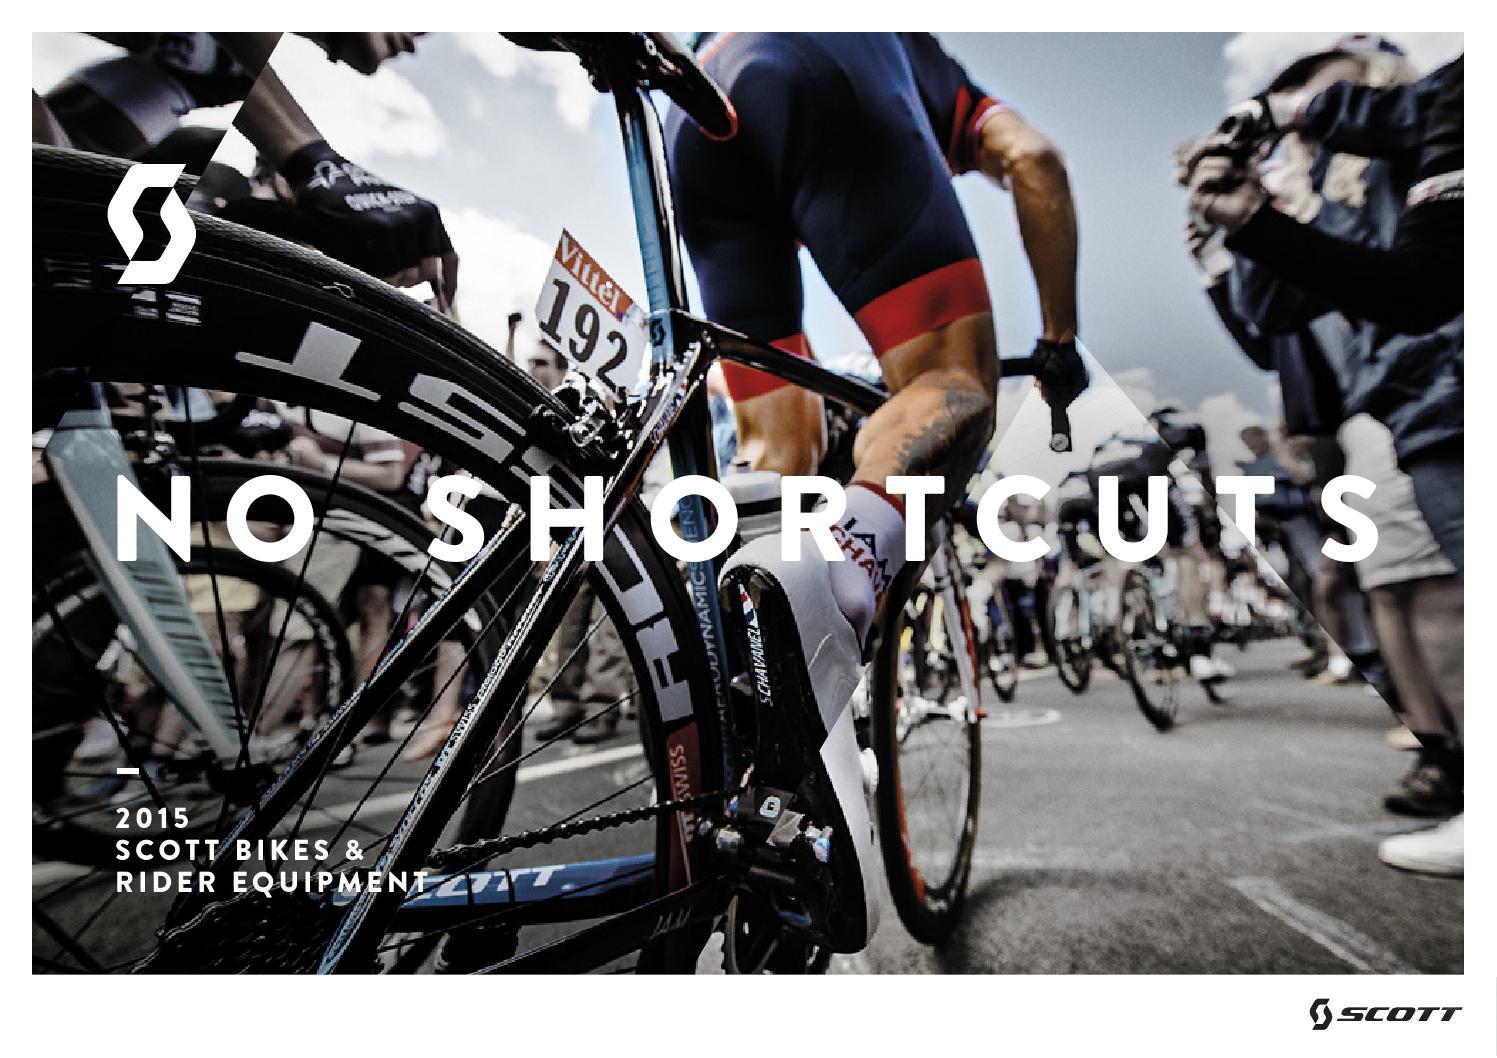 Consumer Bike Issuu Sa By De Scott Catalog 2015 Sports mNP8vywn0O